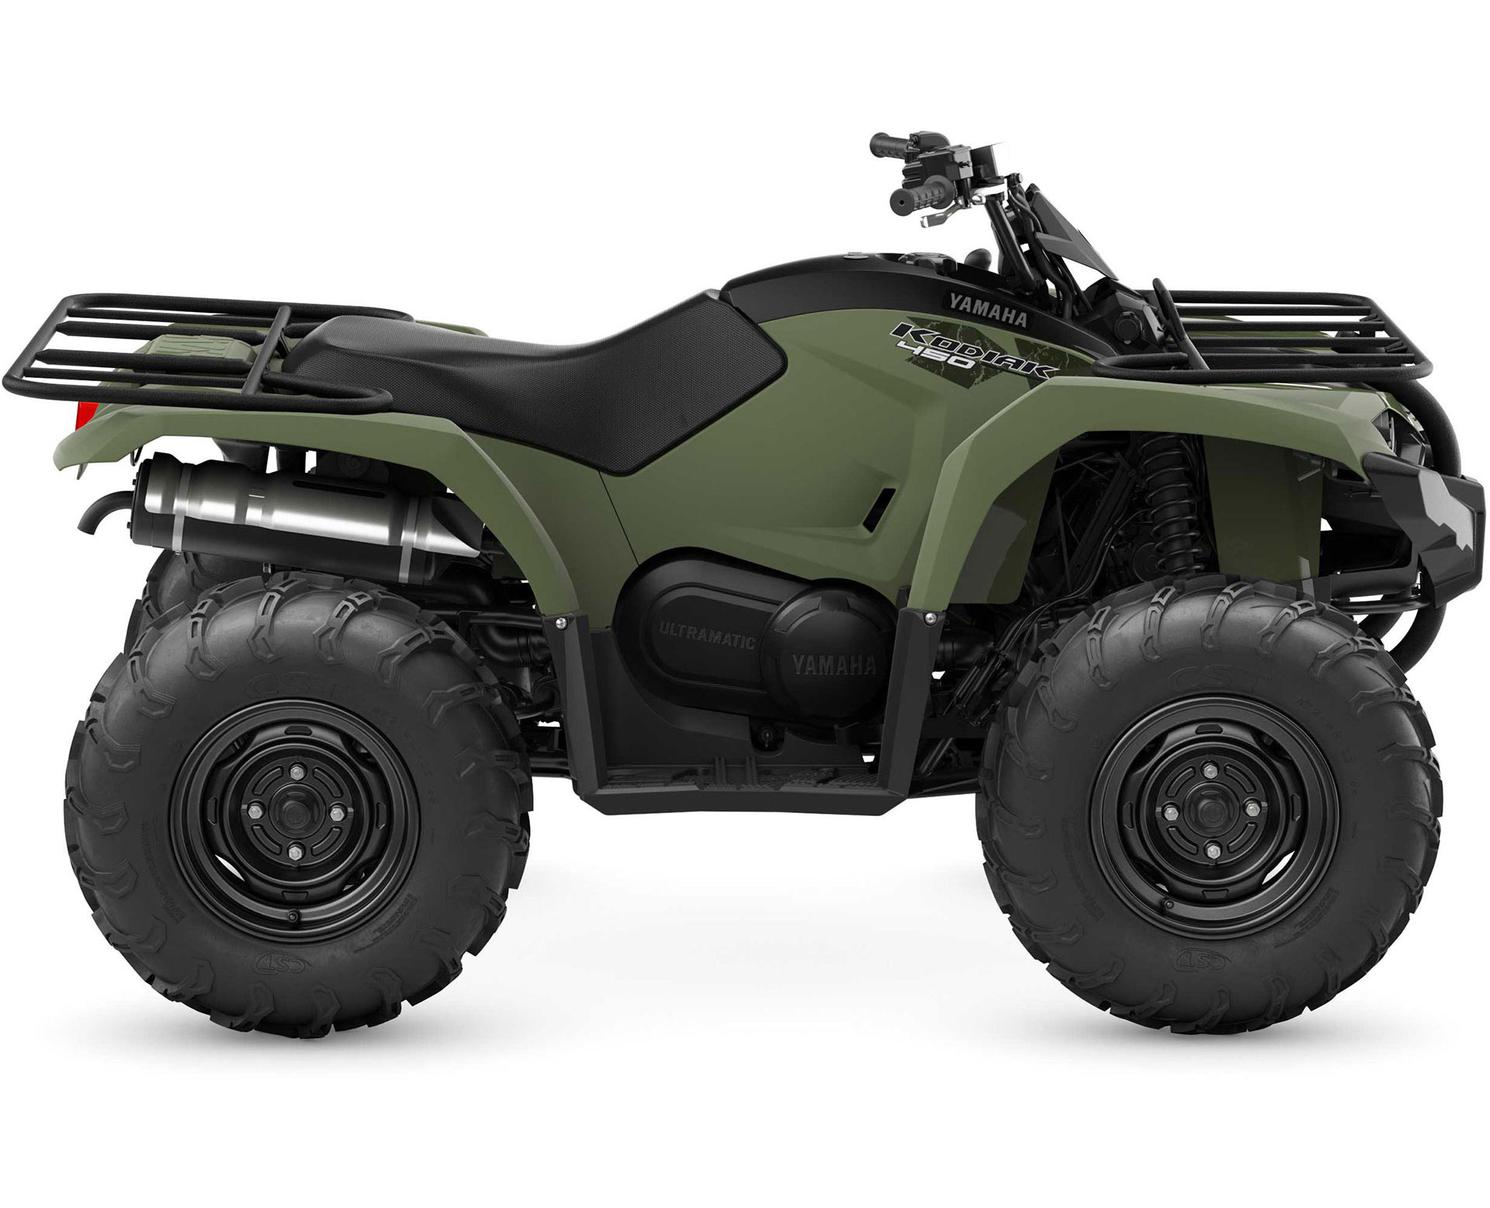 Yamaha Kodiak 450 Vert Tactique 2022